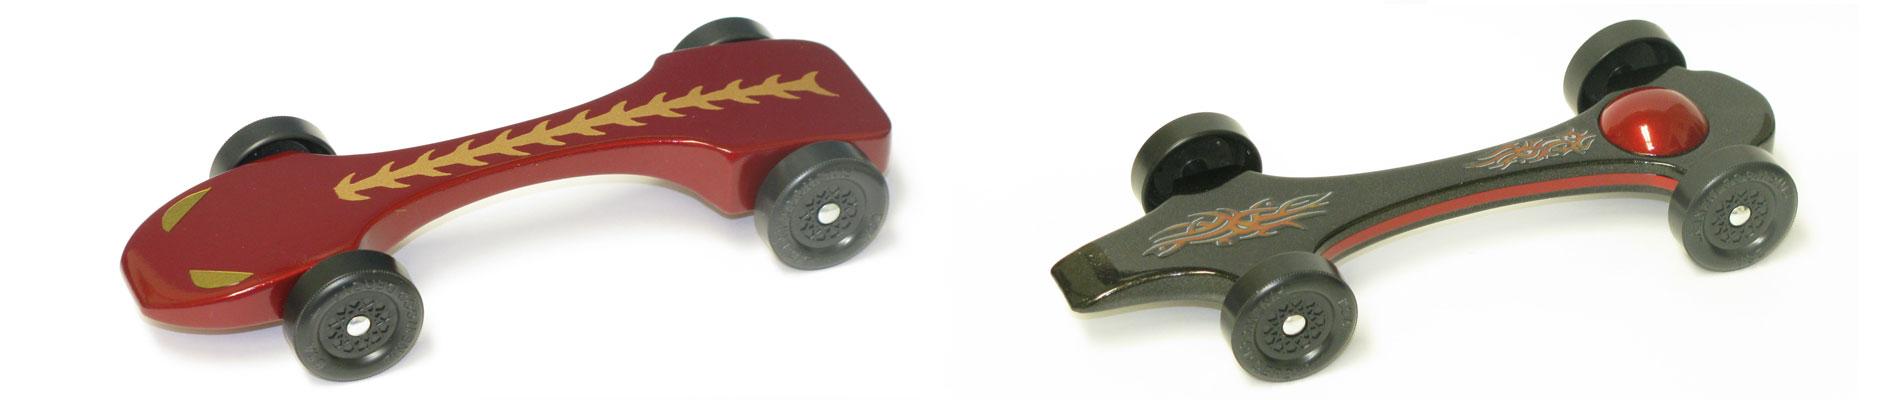 Raptor and Maxinator Pinewood Deby Car Kits